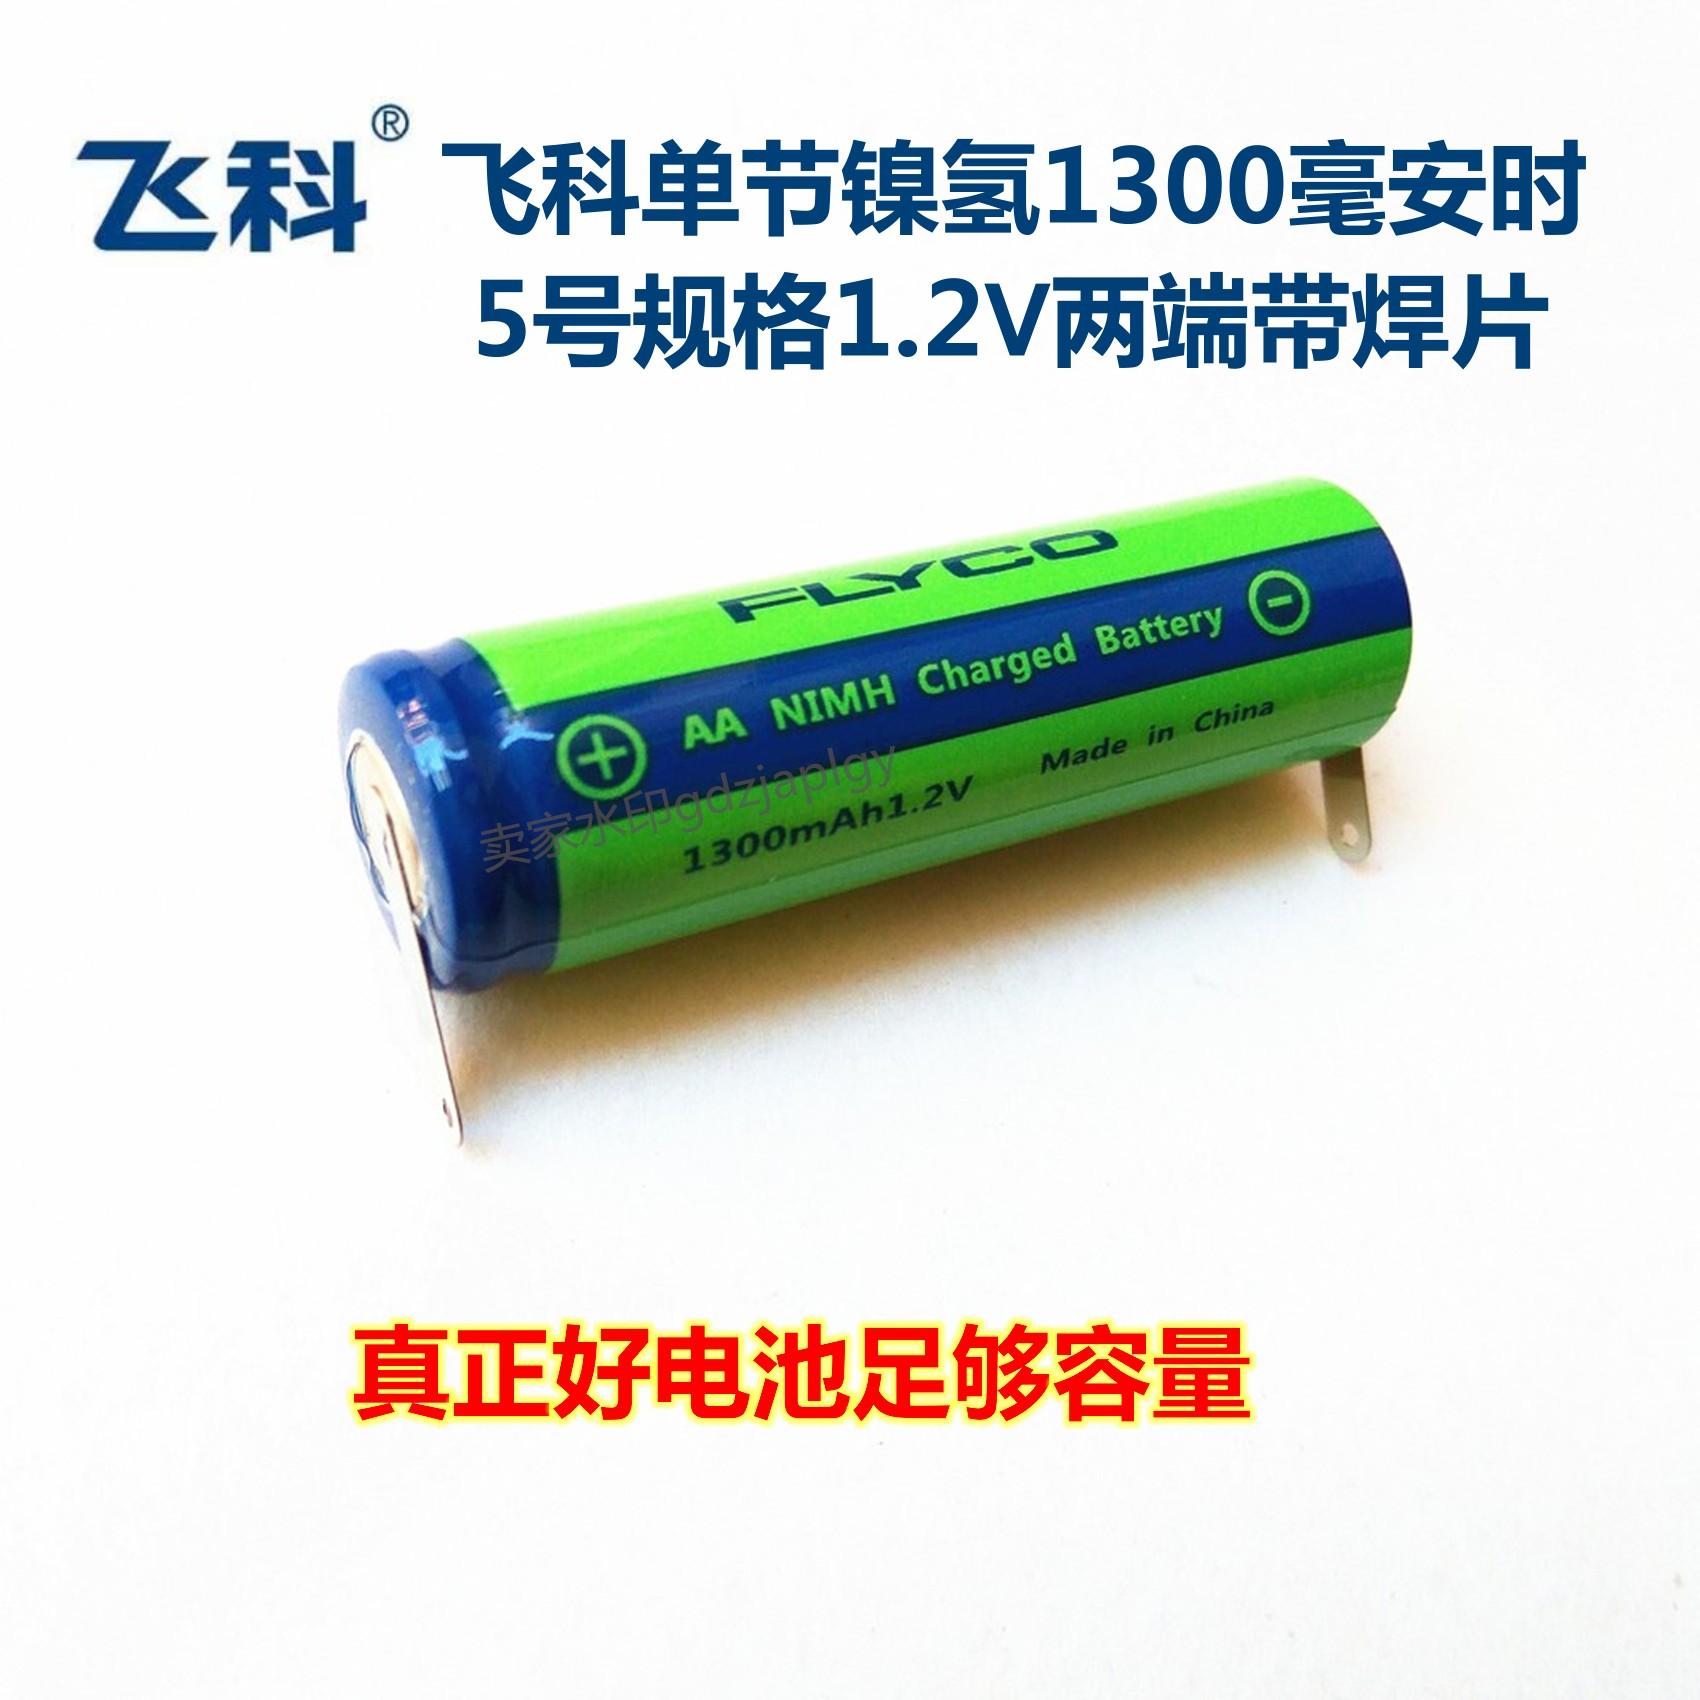 FS711FS802FS806FS812FS816FS818FS819FS861FS373 飞科剃须刃电池